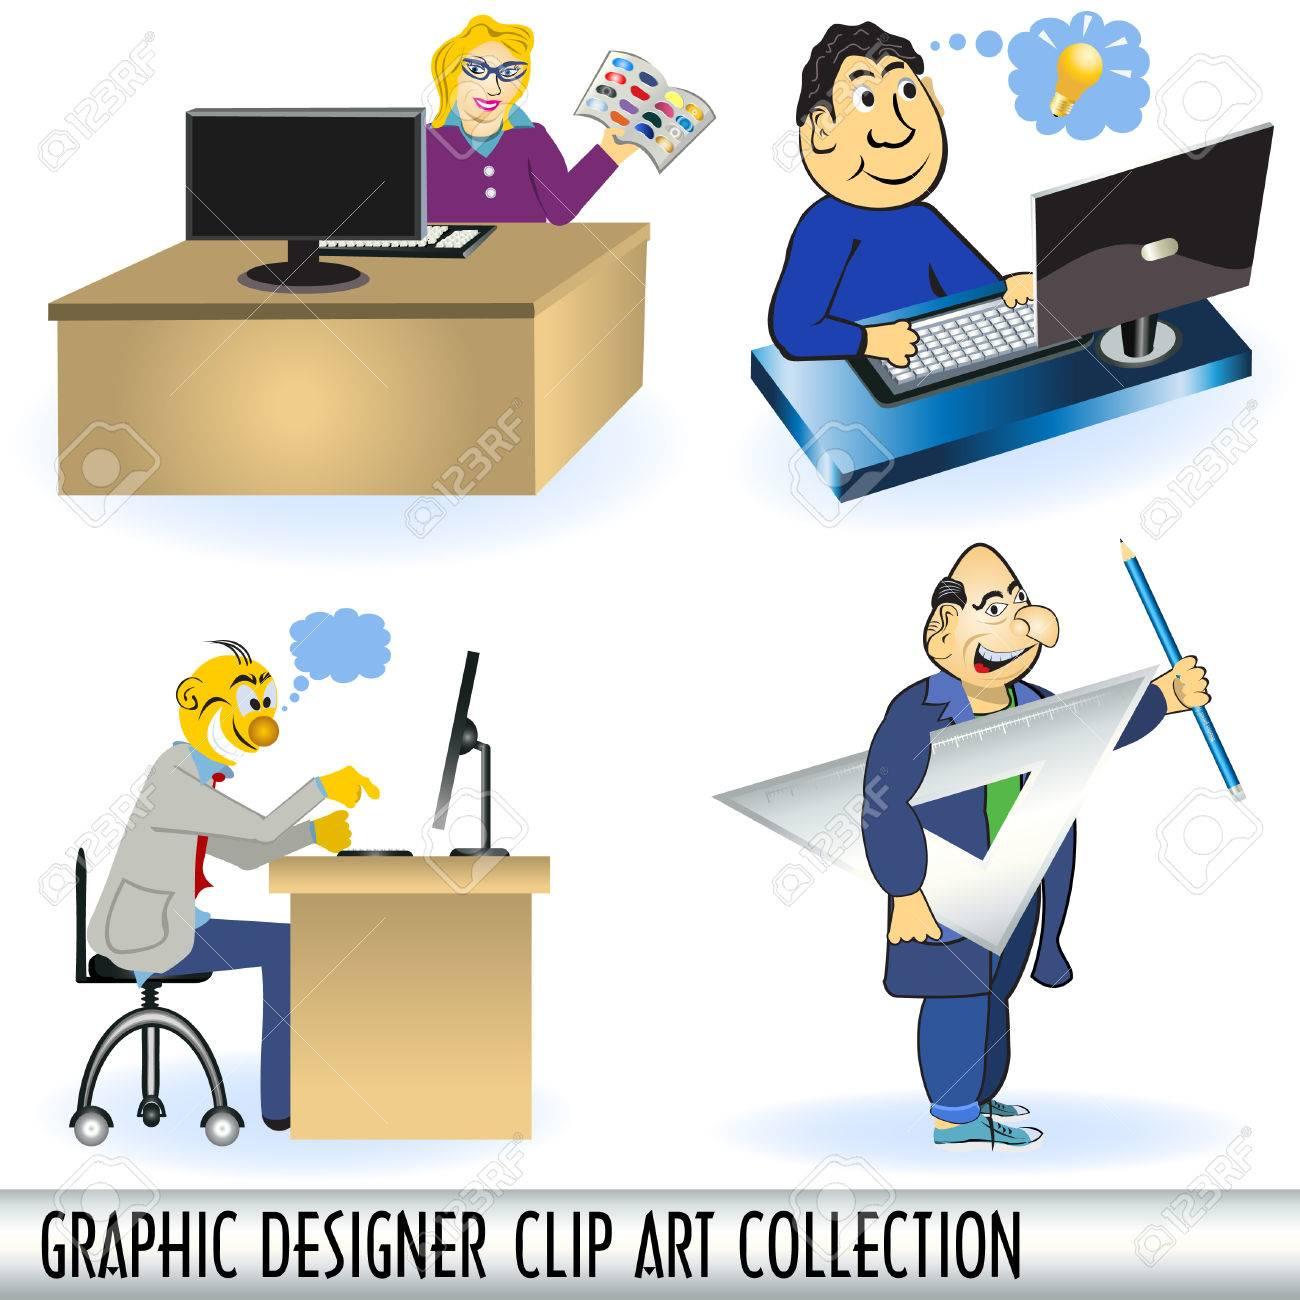 Graphic designer clip art collection.